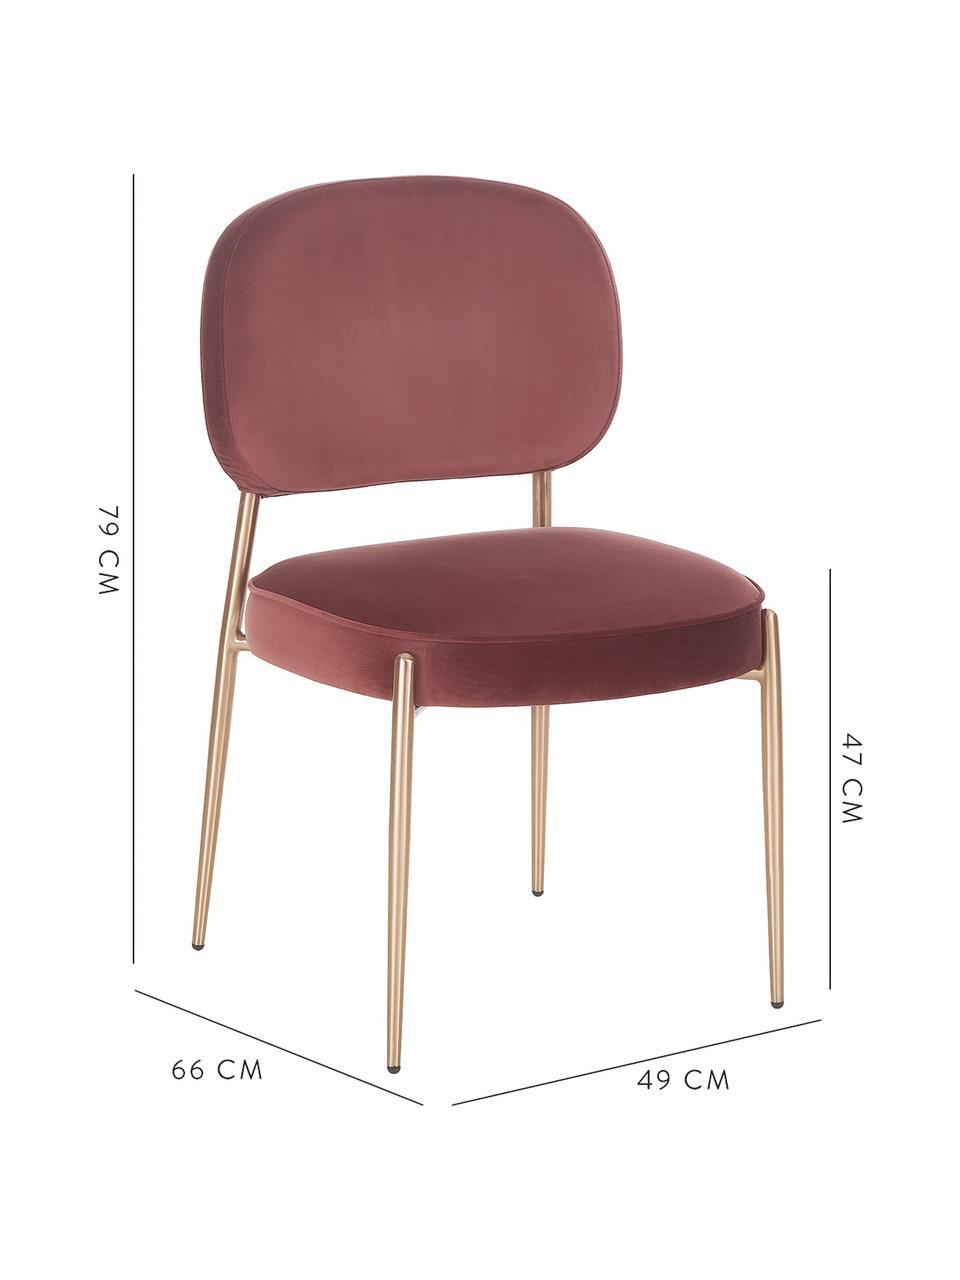 Sedia imbottita in velluto Viggo, Rivestimento: velluto (poliestere) 50.0, Velluto marrone, Larg. 49 x Prof. 66 cm